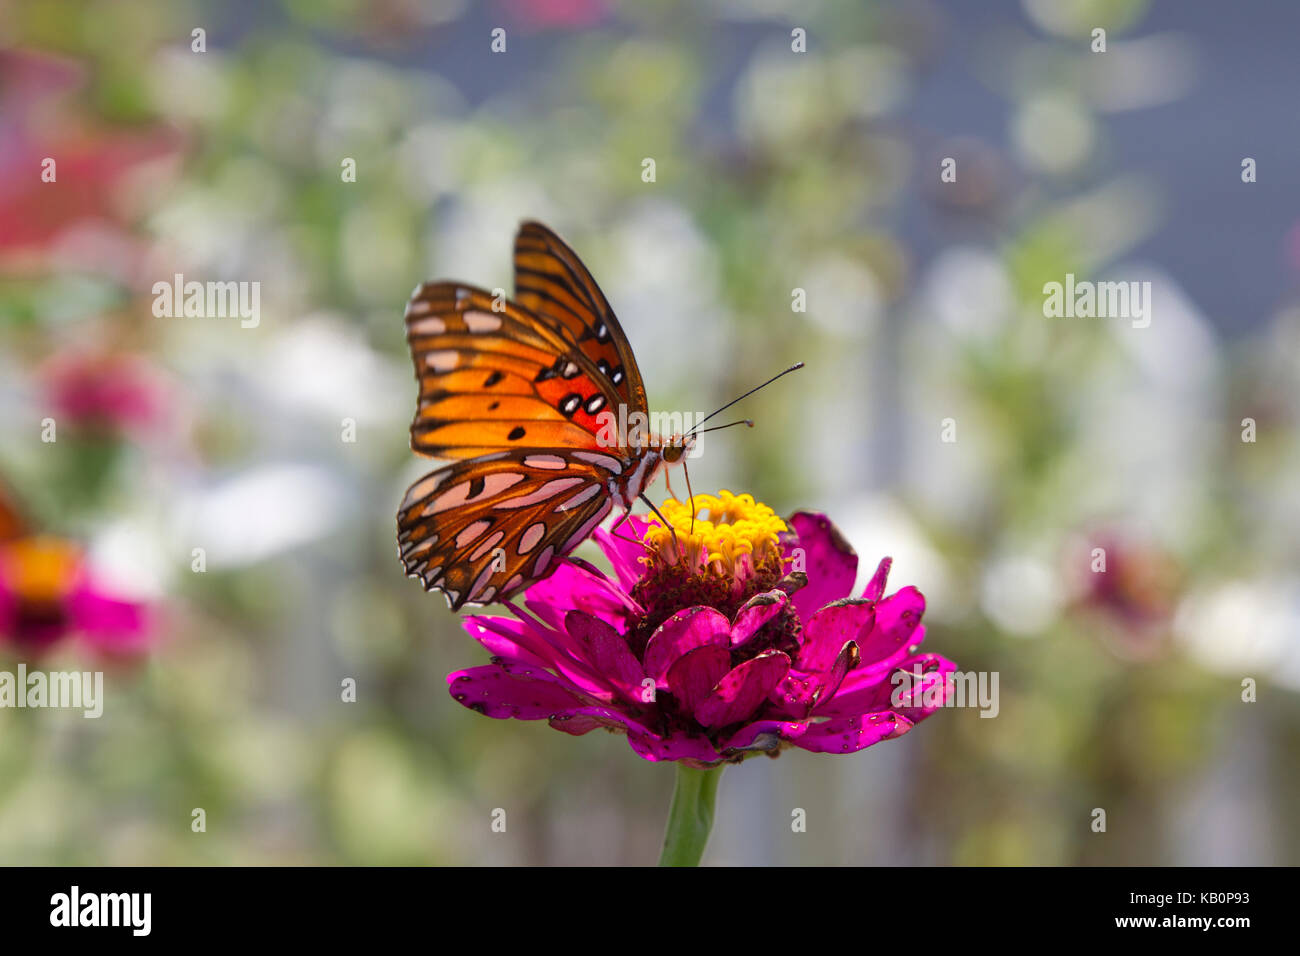 Golf Fritillaryschmetterling auf Magenta Blume Stockbild